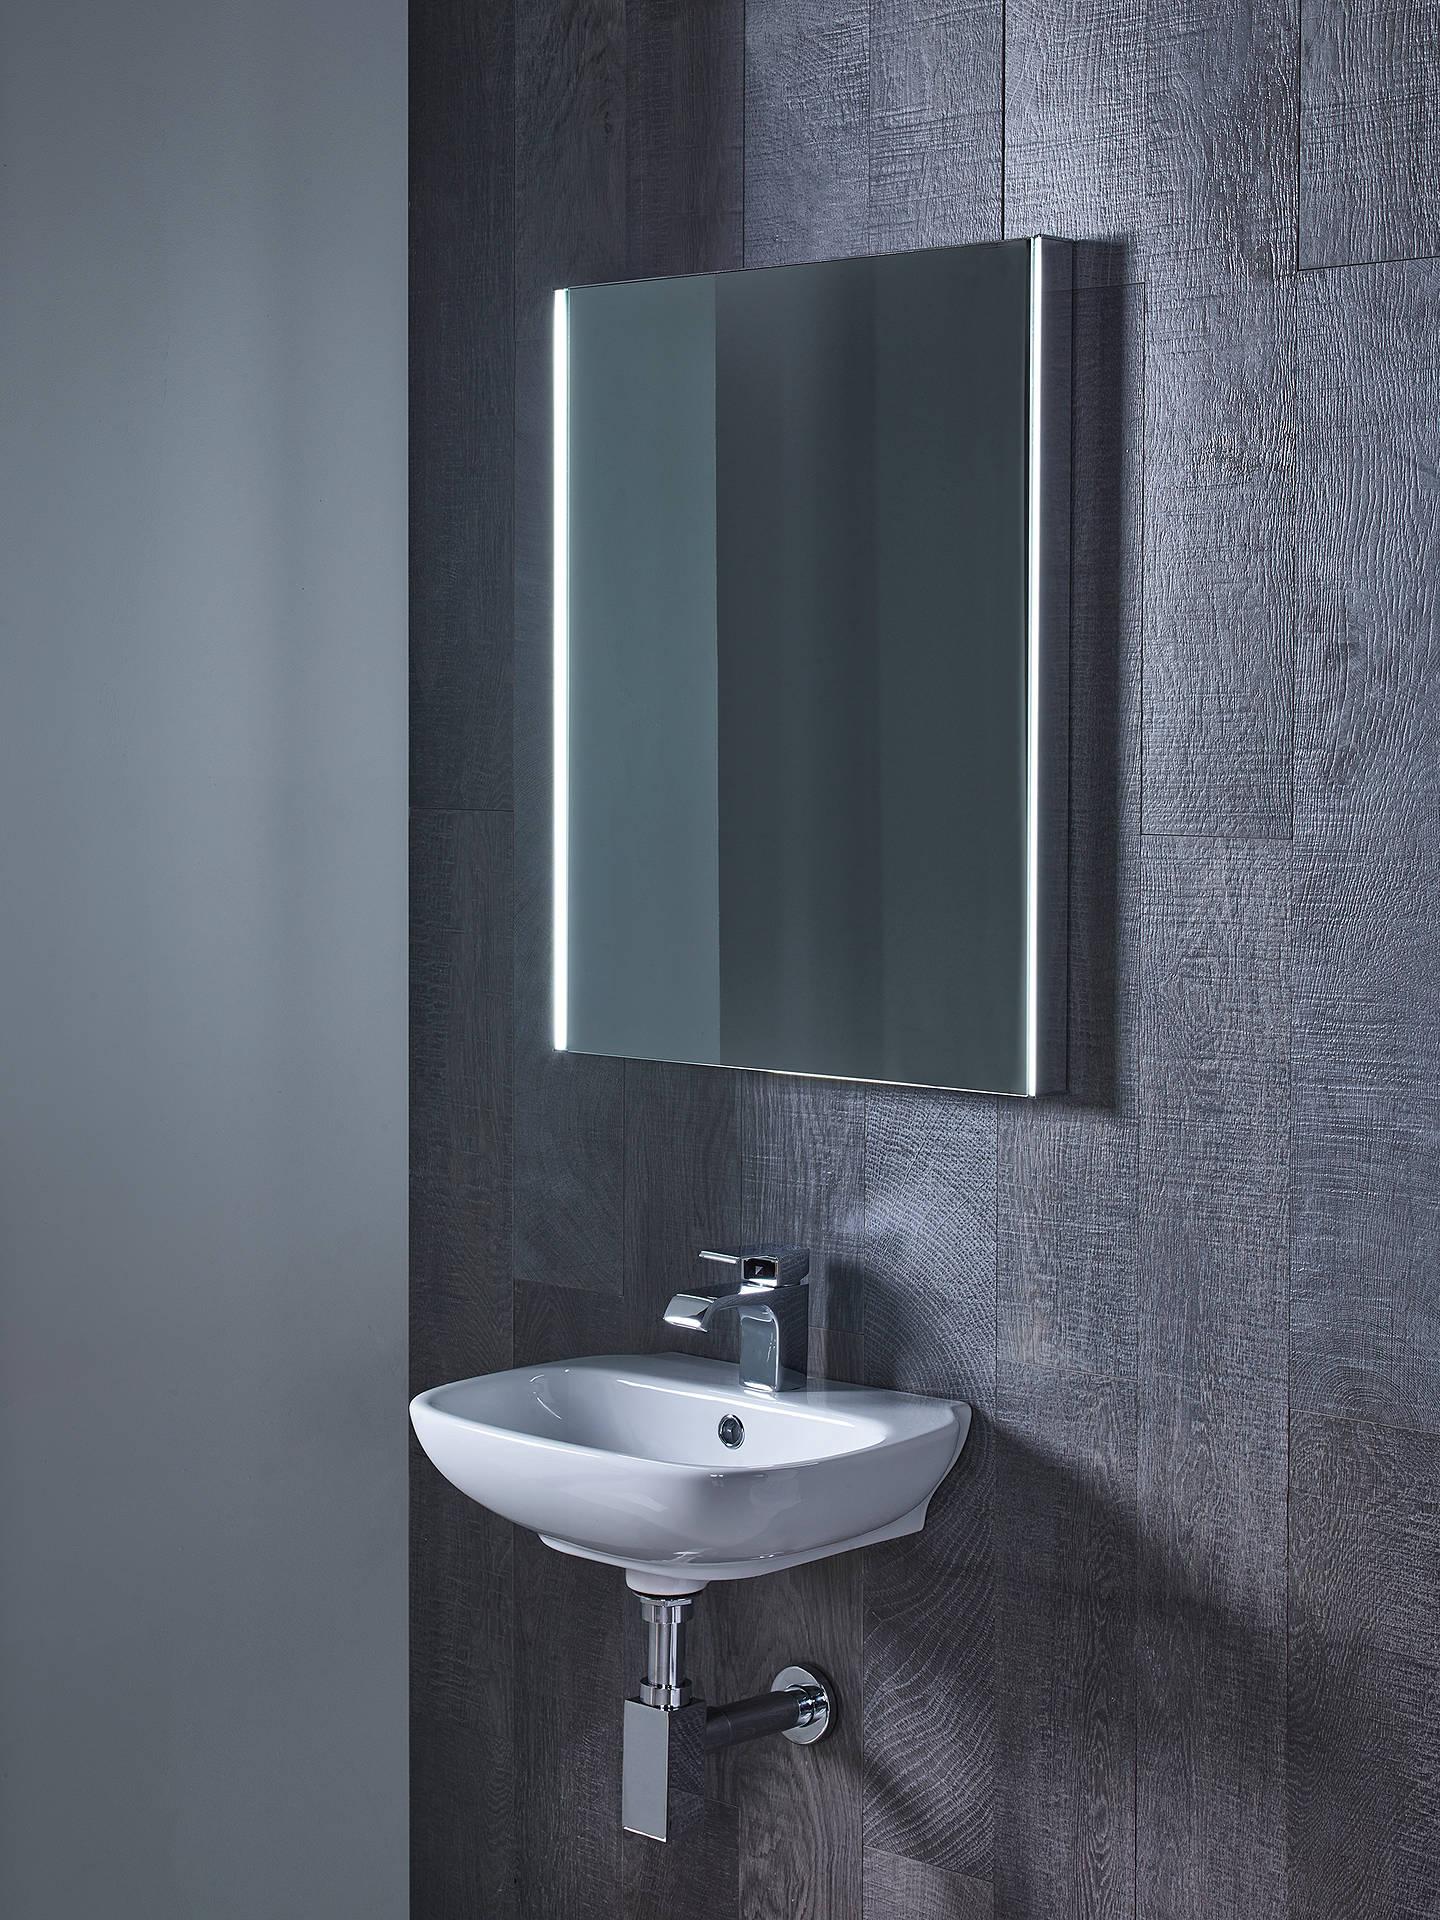 Bathroom Mirrors Illuminated: Roper Rhodes Precise Illuminated Bathroom Mirror At John